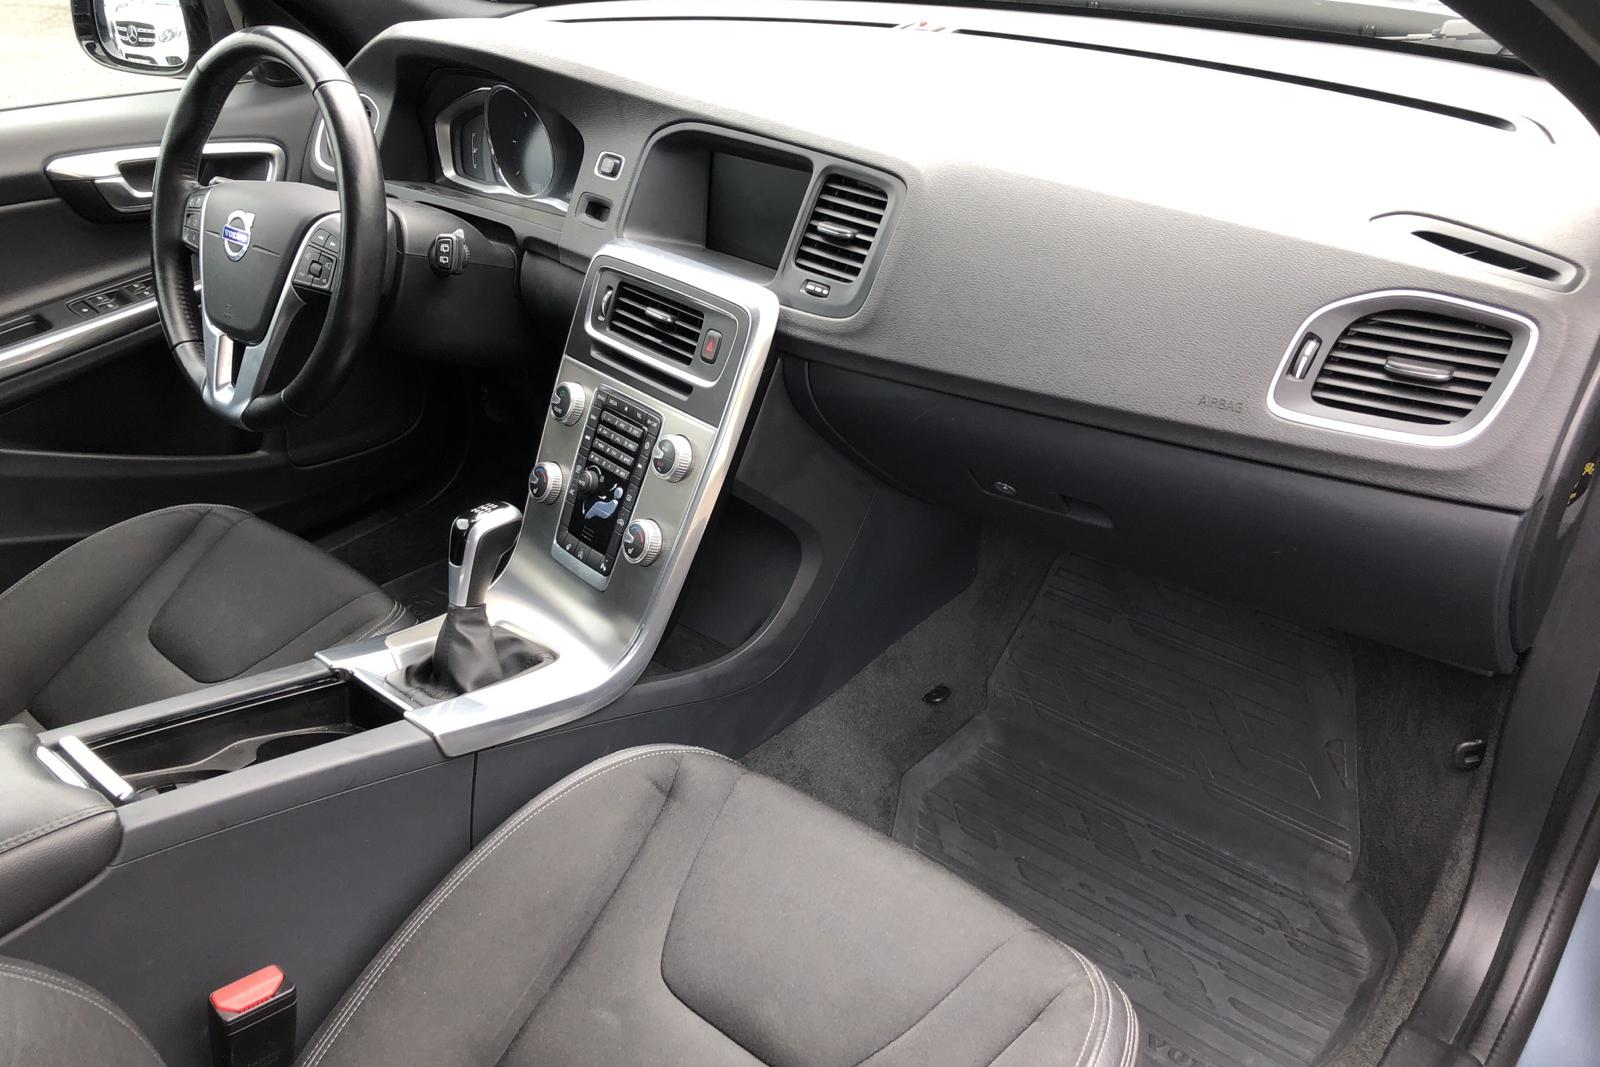 Volvo V60 D3 Cross Country (150hk) - 72 140 km - Manual - Light Blue - 2017